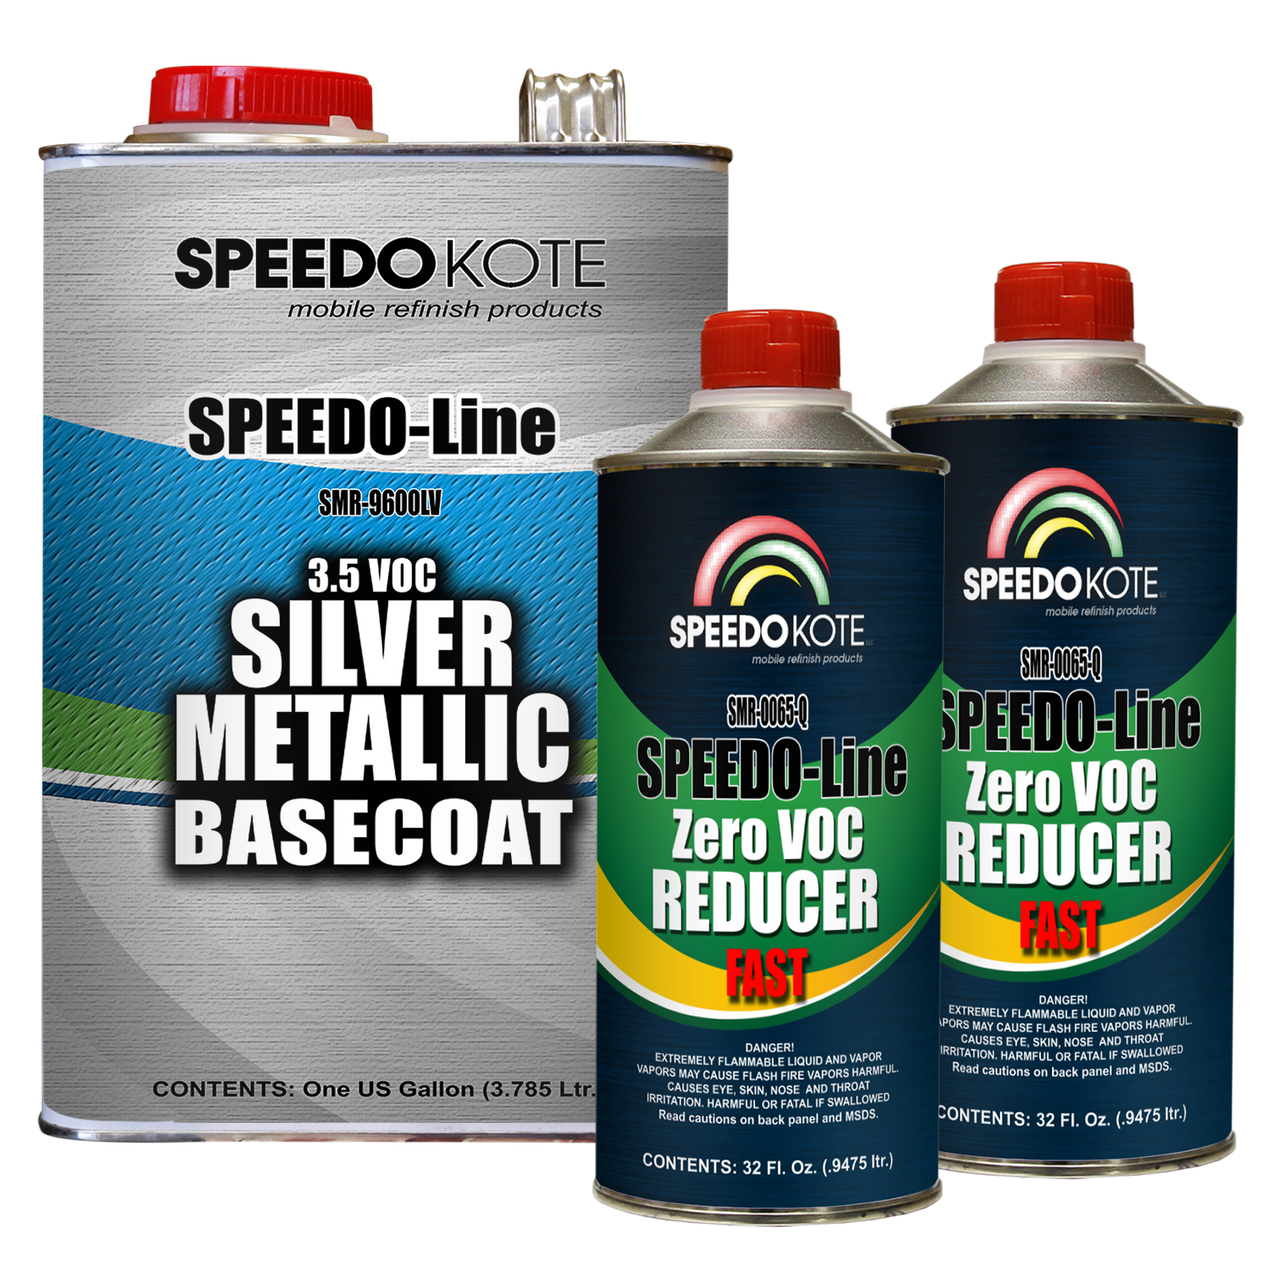 Silver Metallic 3.5 voc Base Coat Kit, Basecoat & Reducer, SMR-9600LV/0065